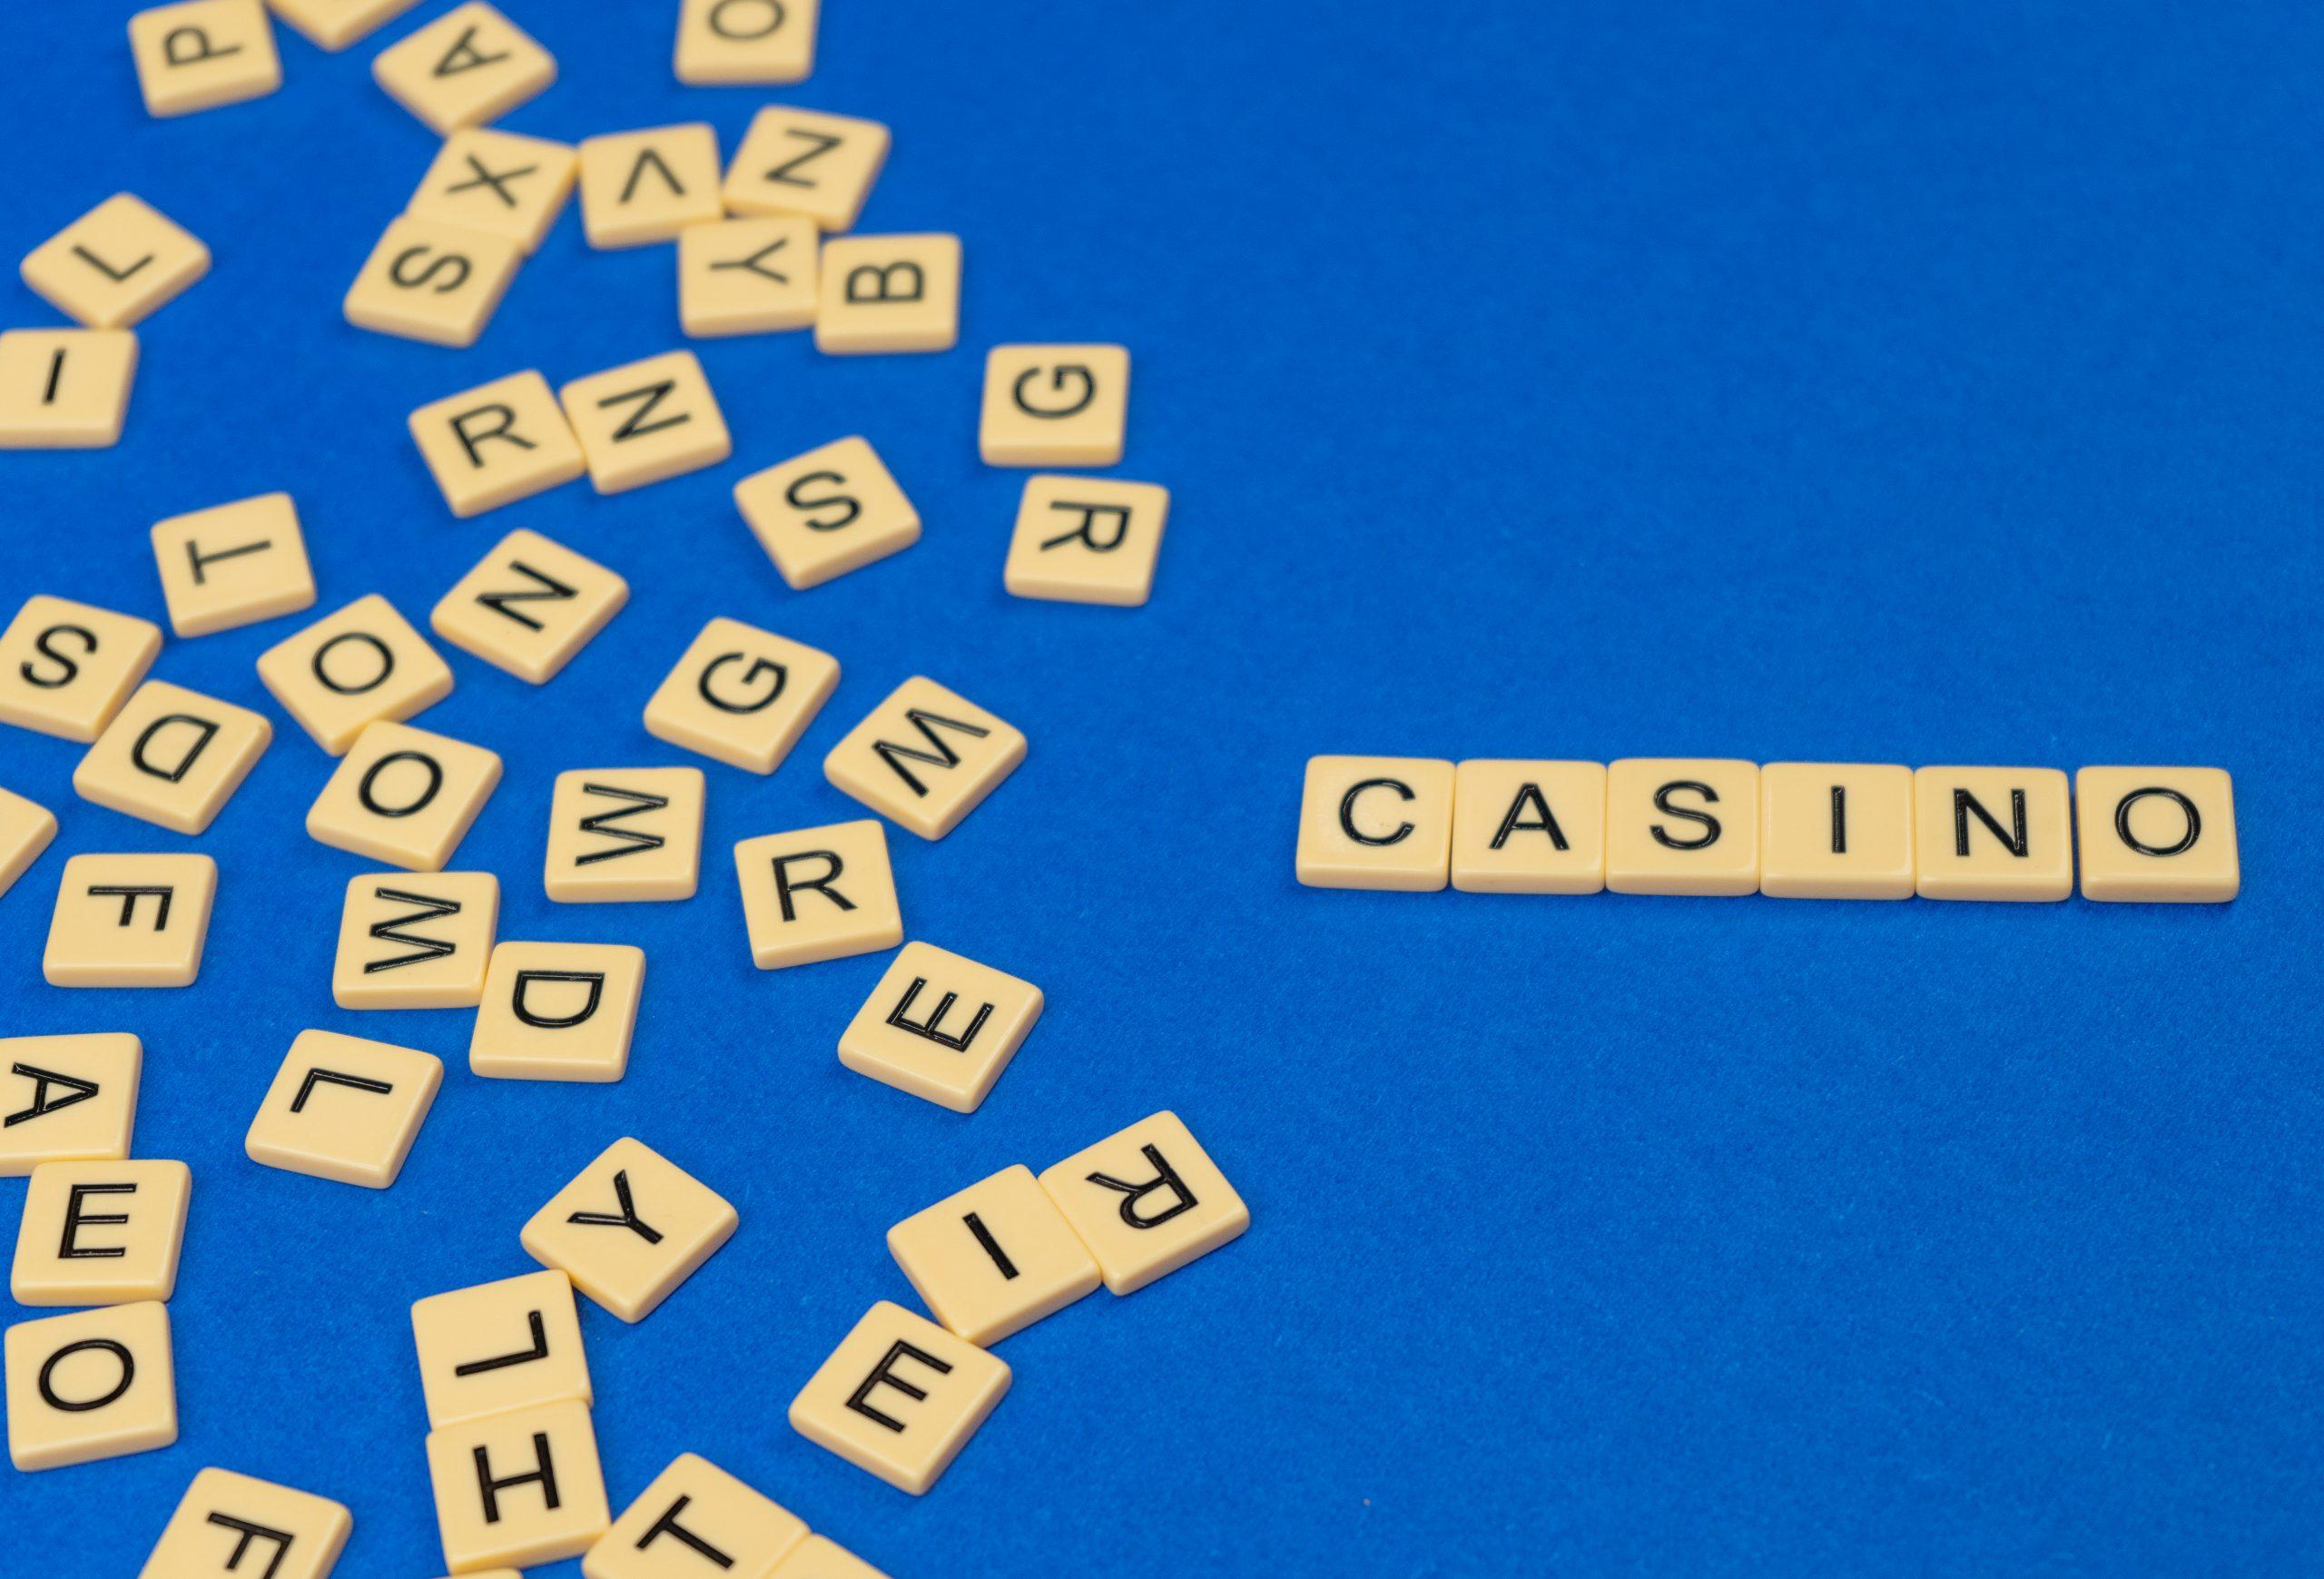 Casino in Word